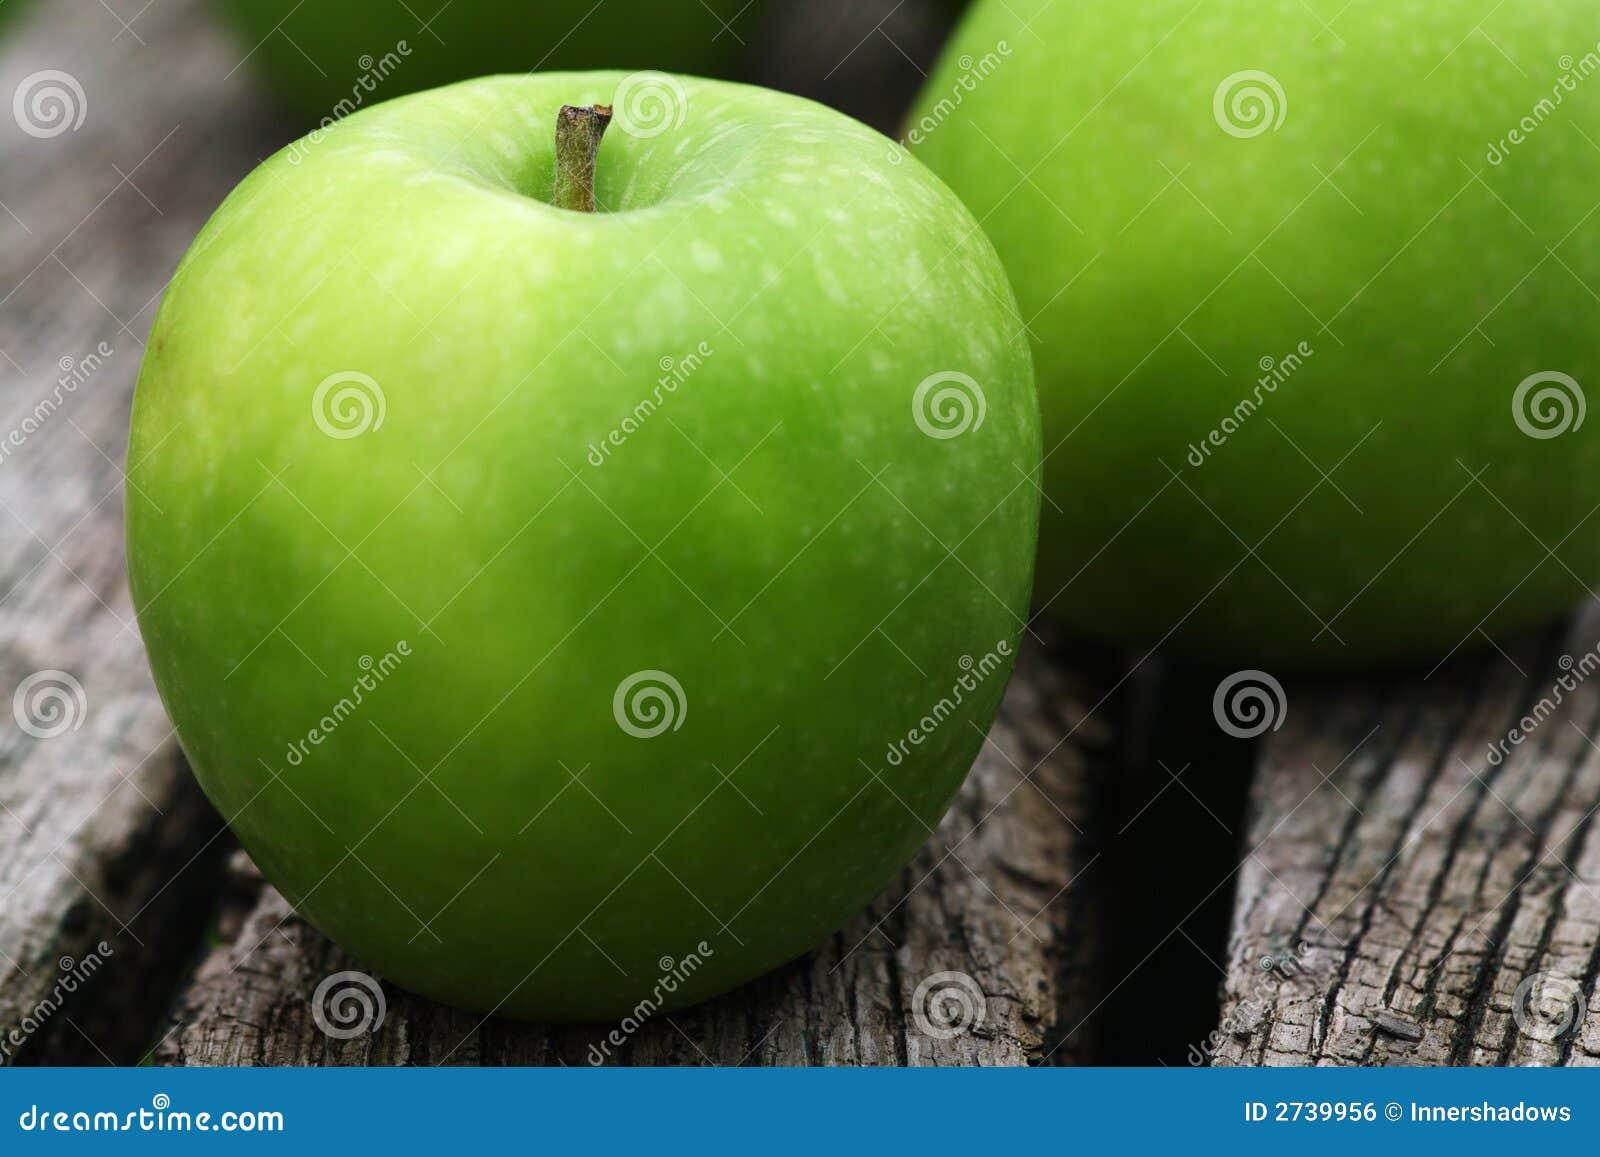 De appelen van de Granny Smith